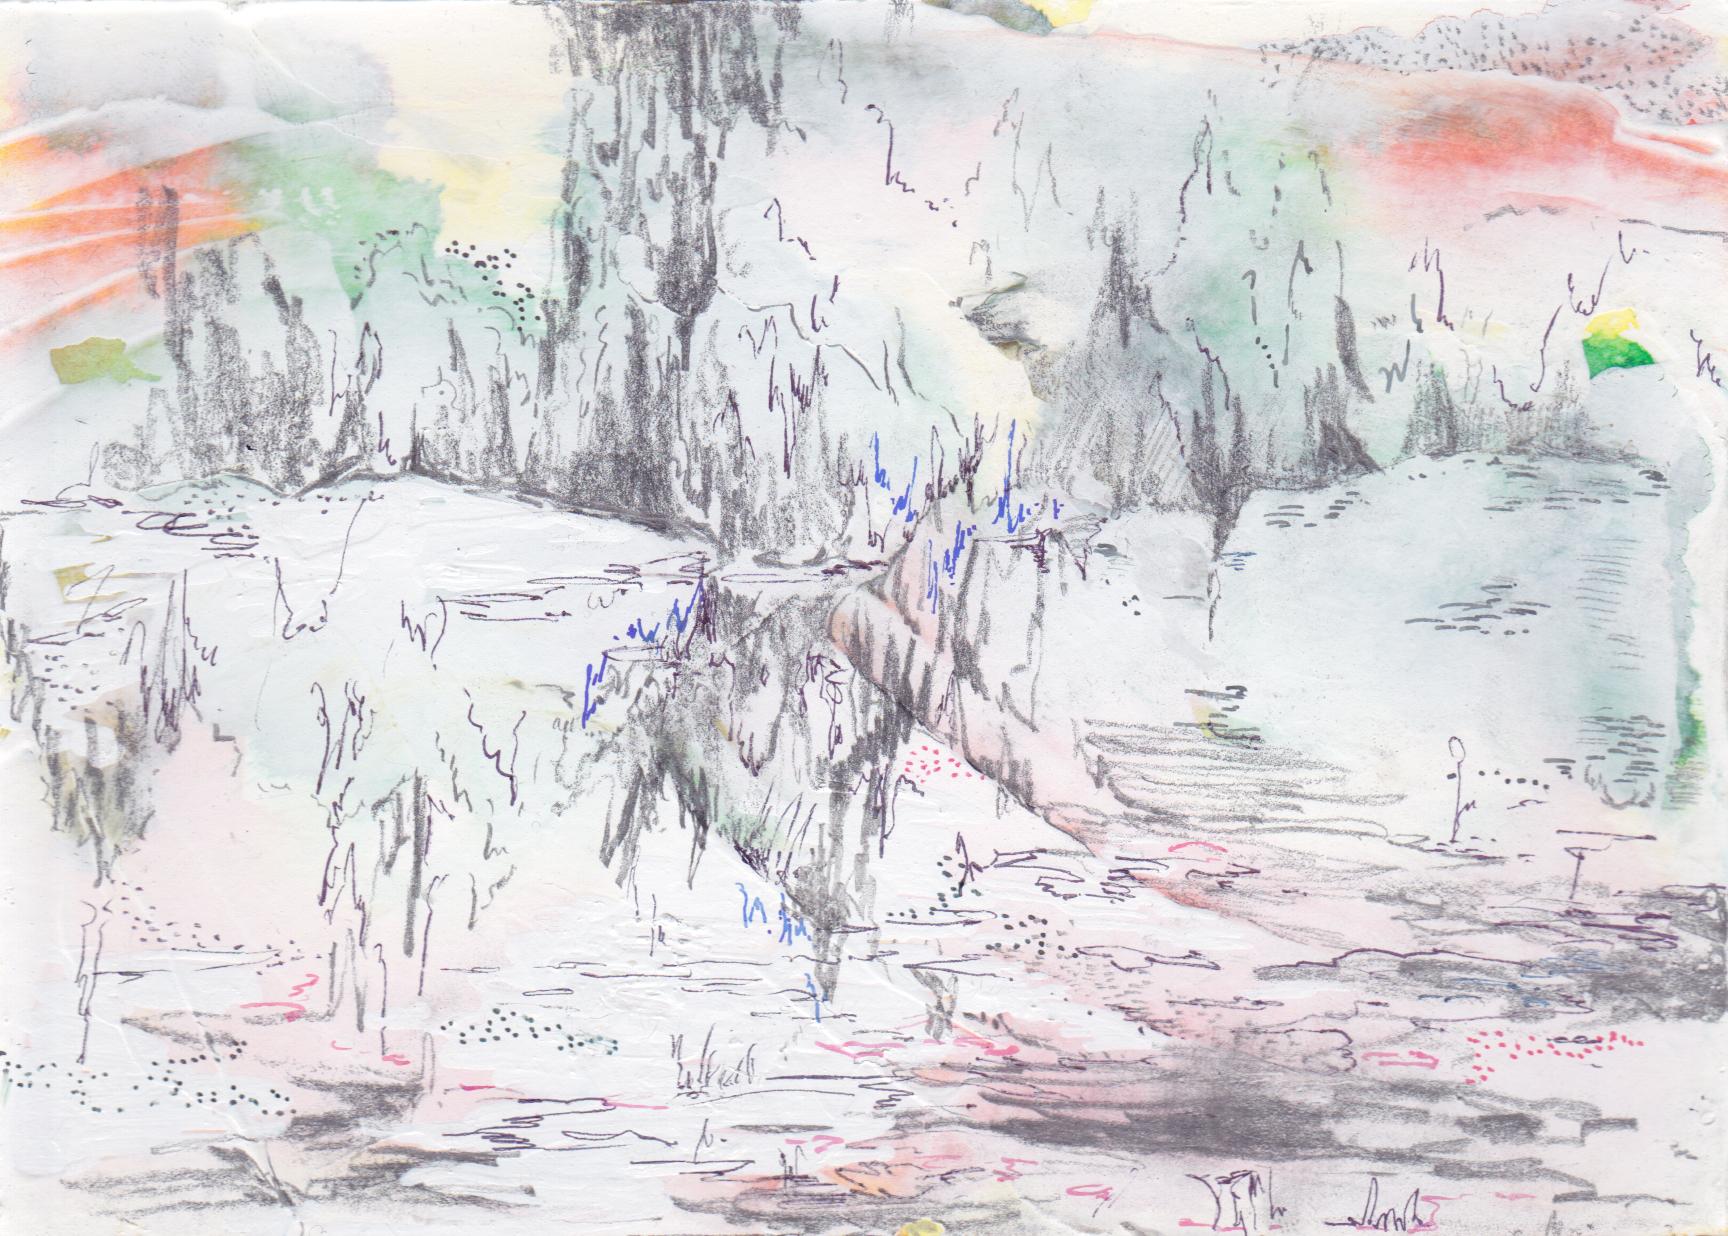 yuhino furu yama夕日のふる山